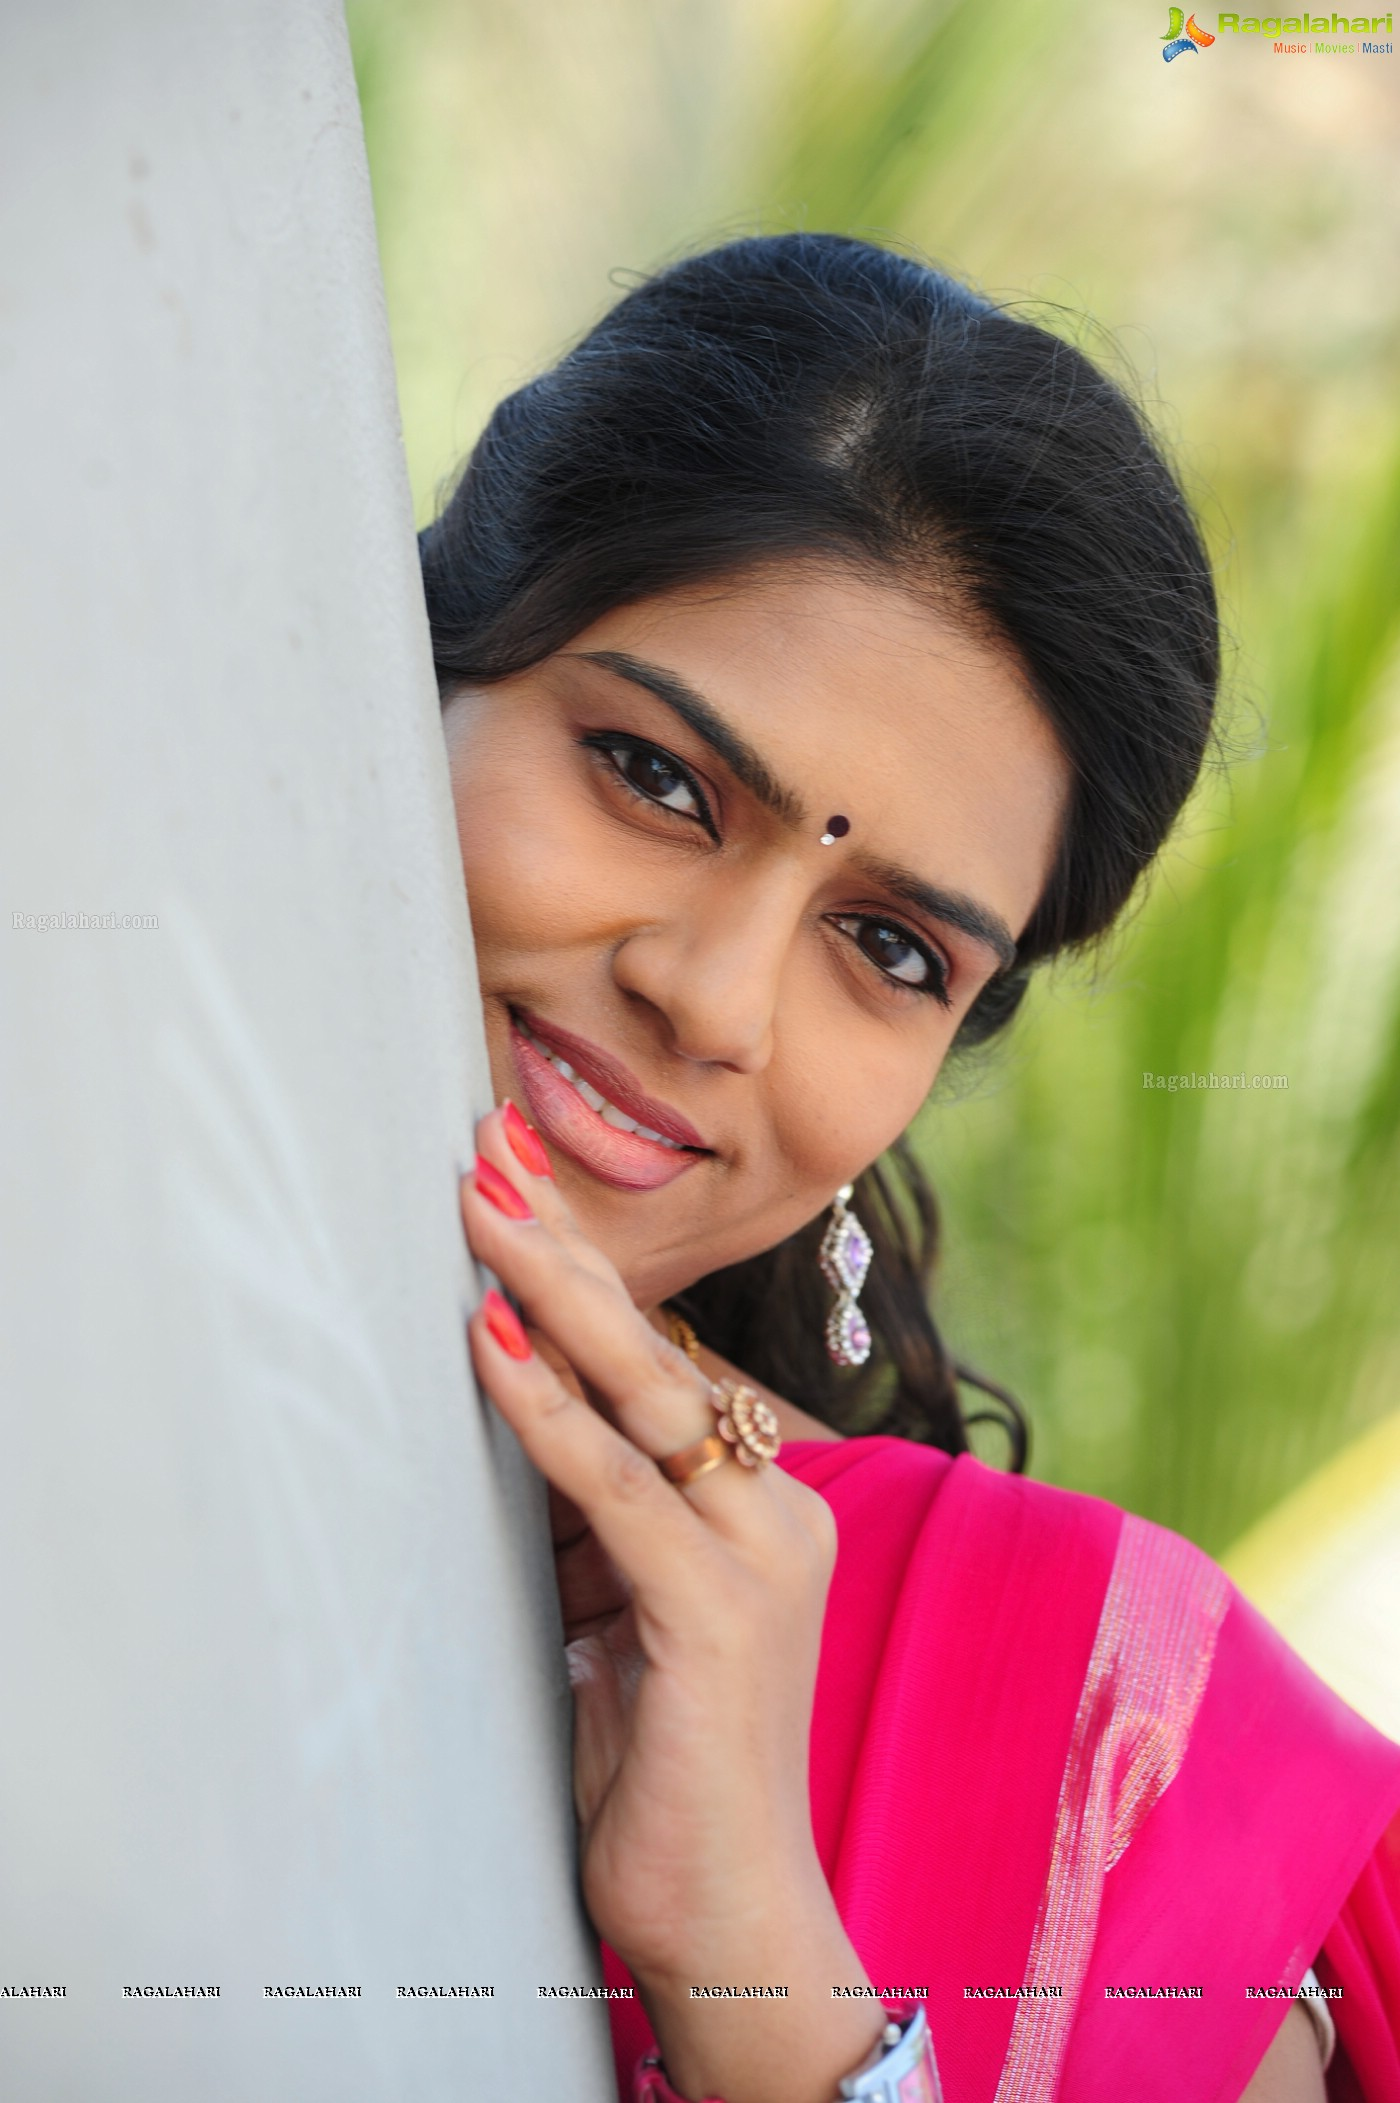 Bhavana posters image 31 tollywood actress imagesimages bhavana posters altavistaventures Gallery